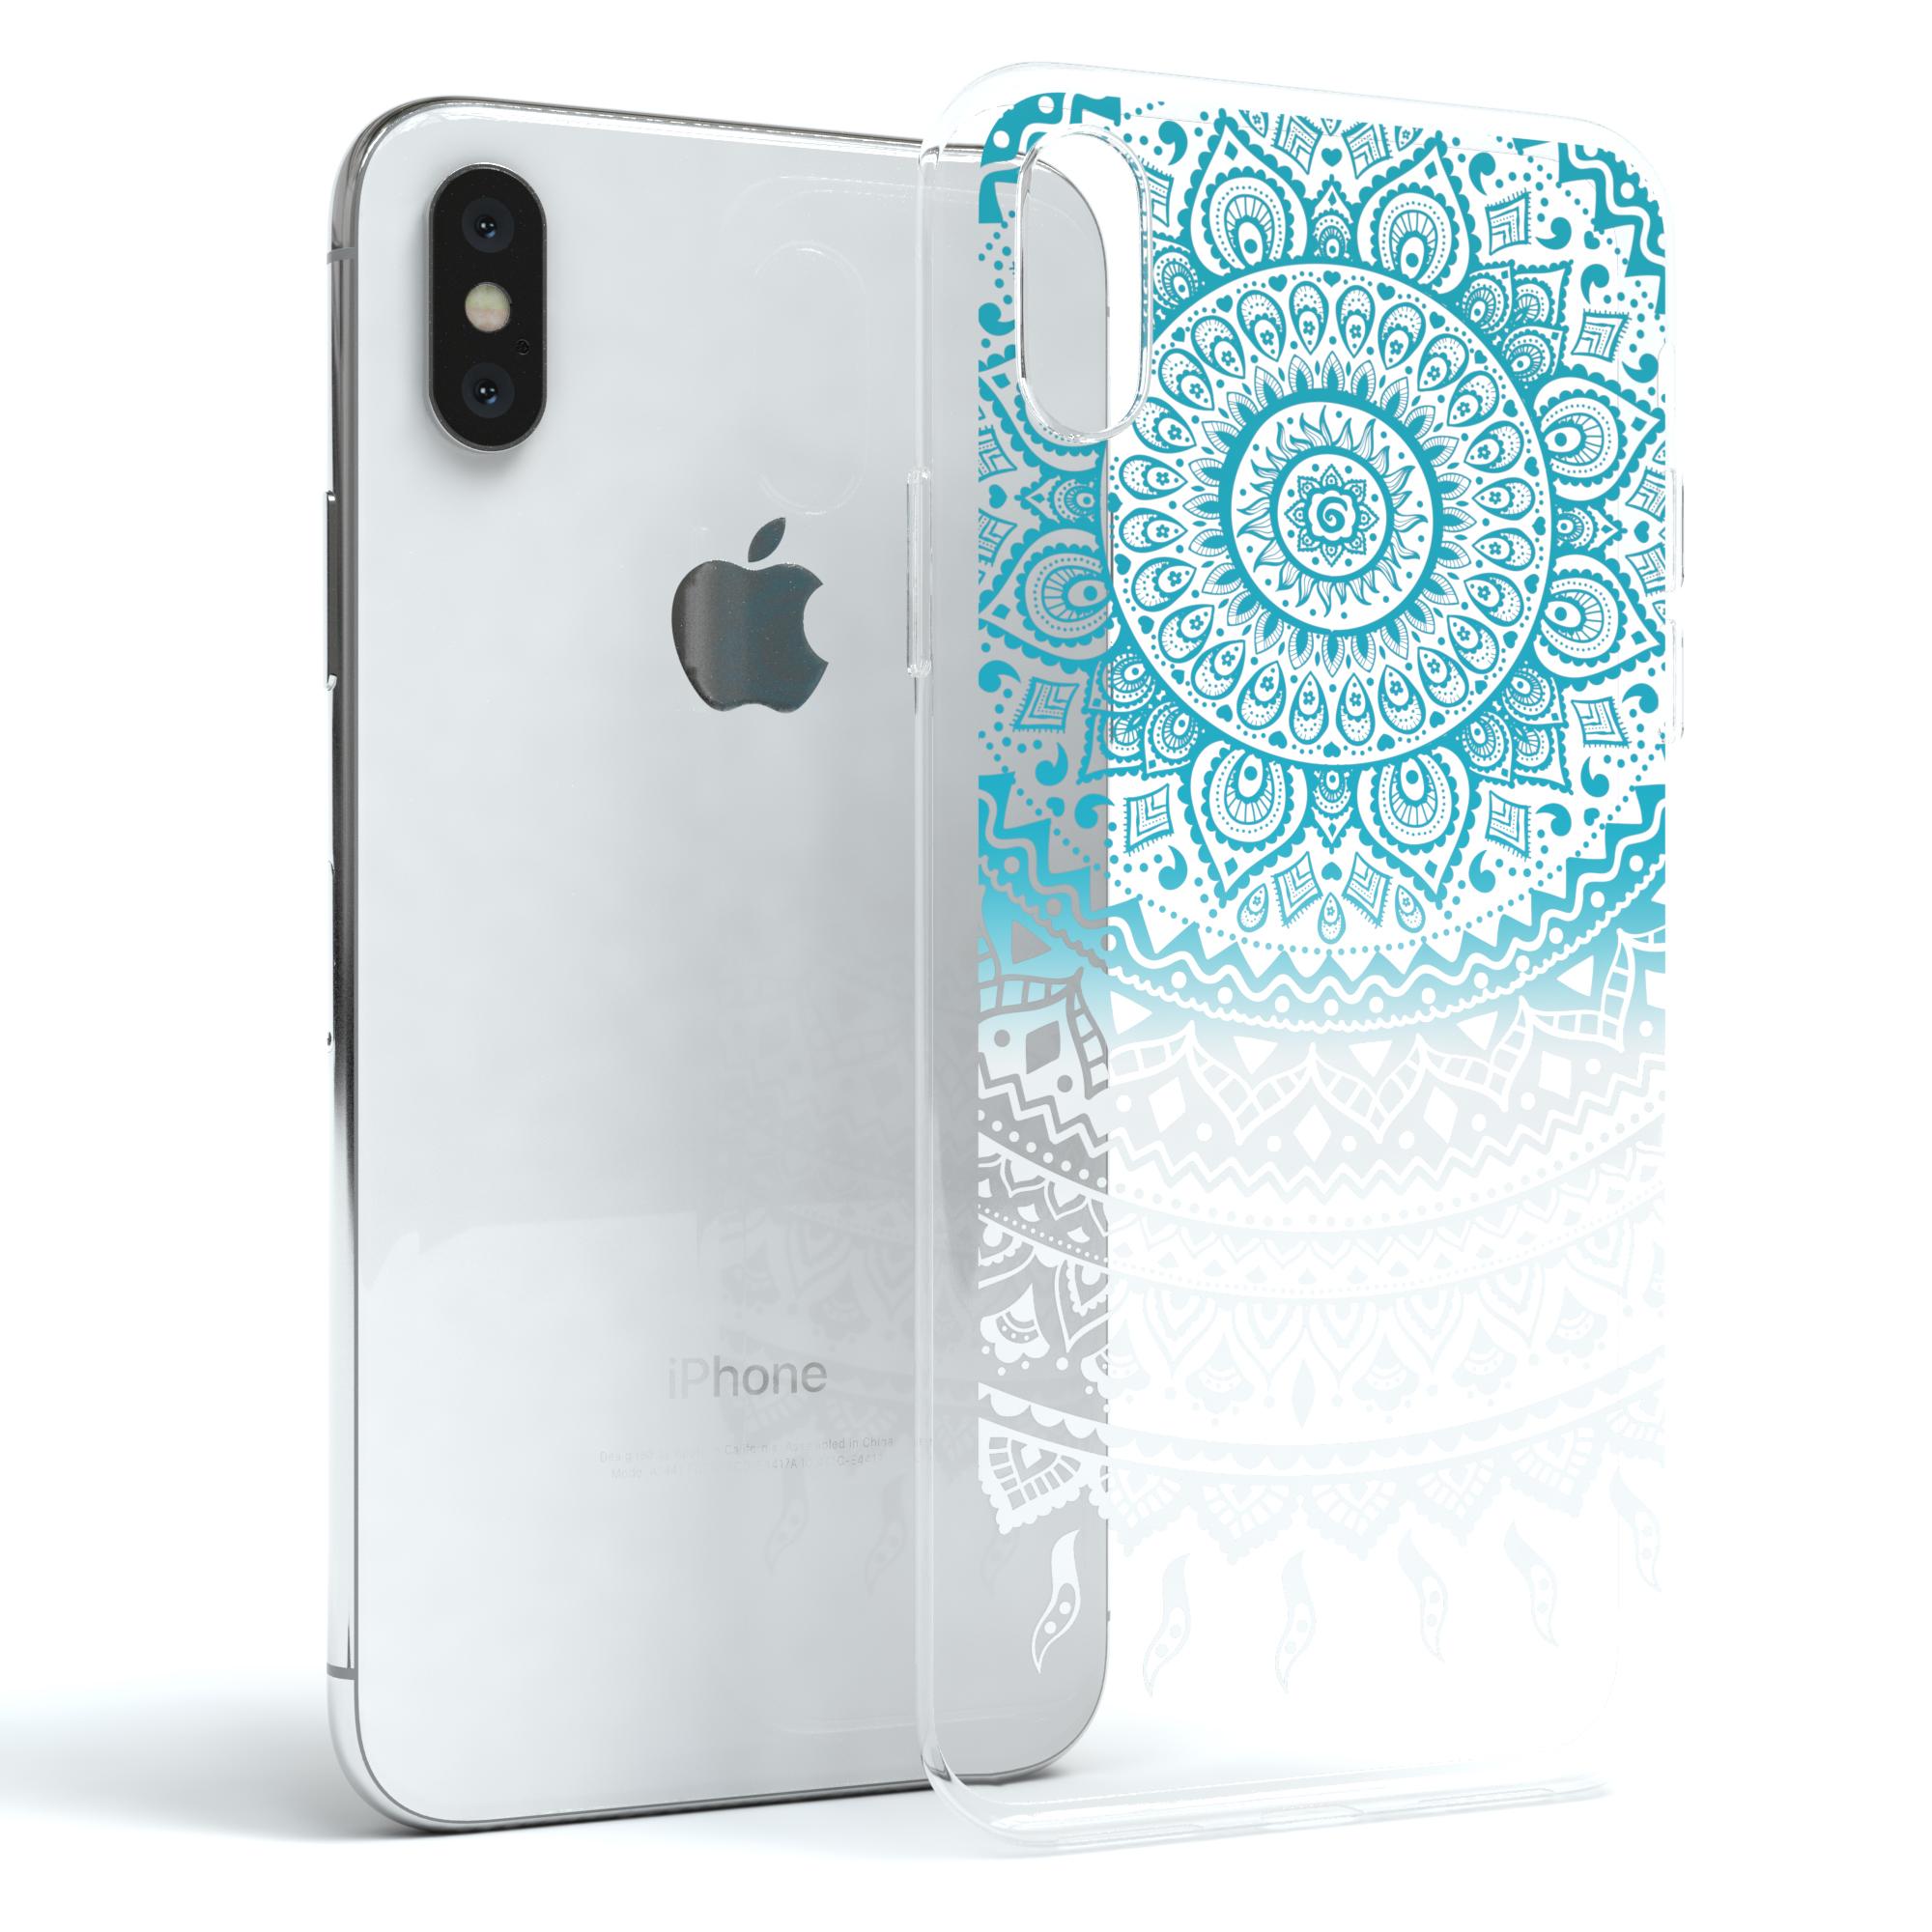 Huelle-fuer-Apple-iPhone-X-Schutz-Cover-Handy-Case-Motiv-Blau-Weiss